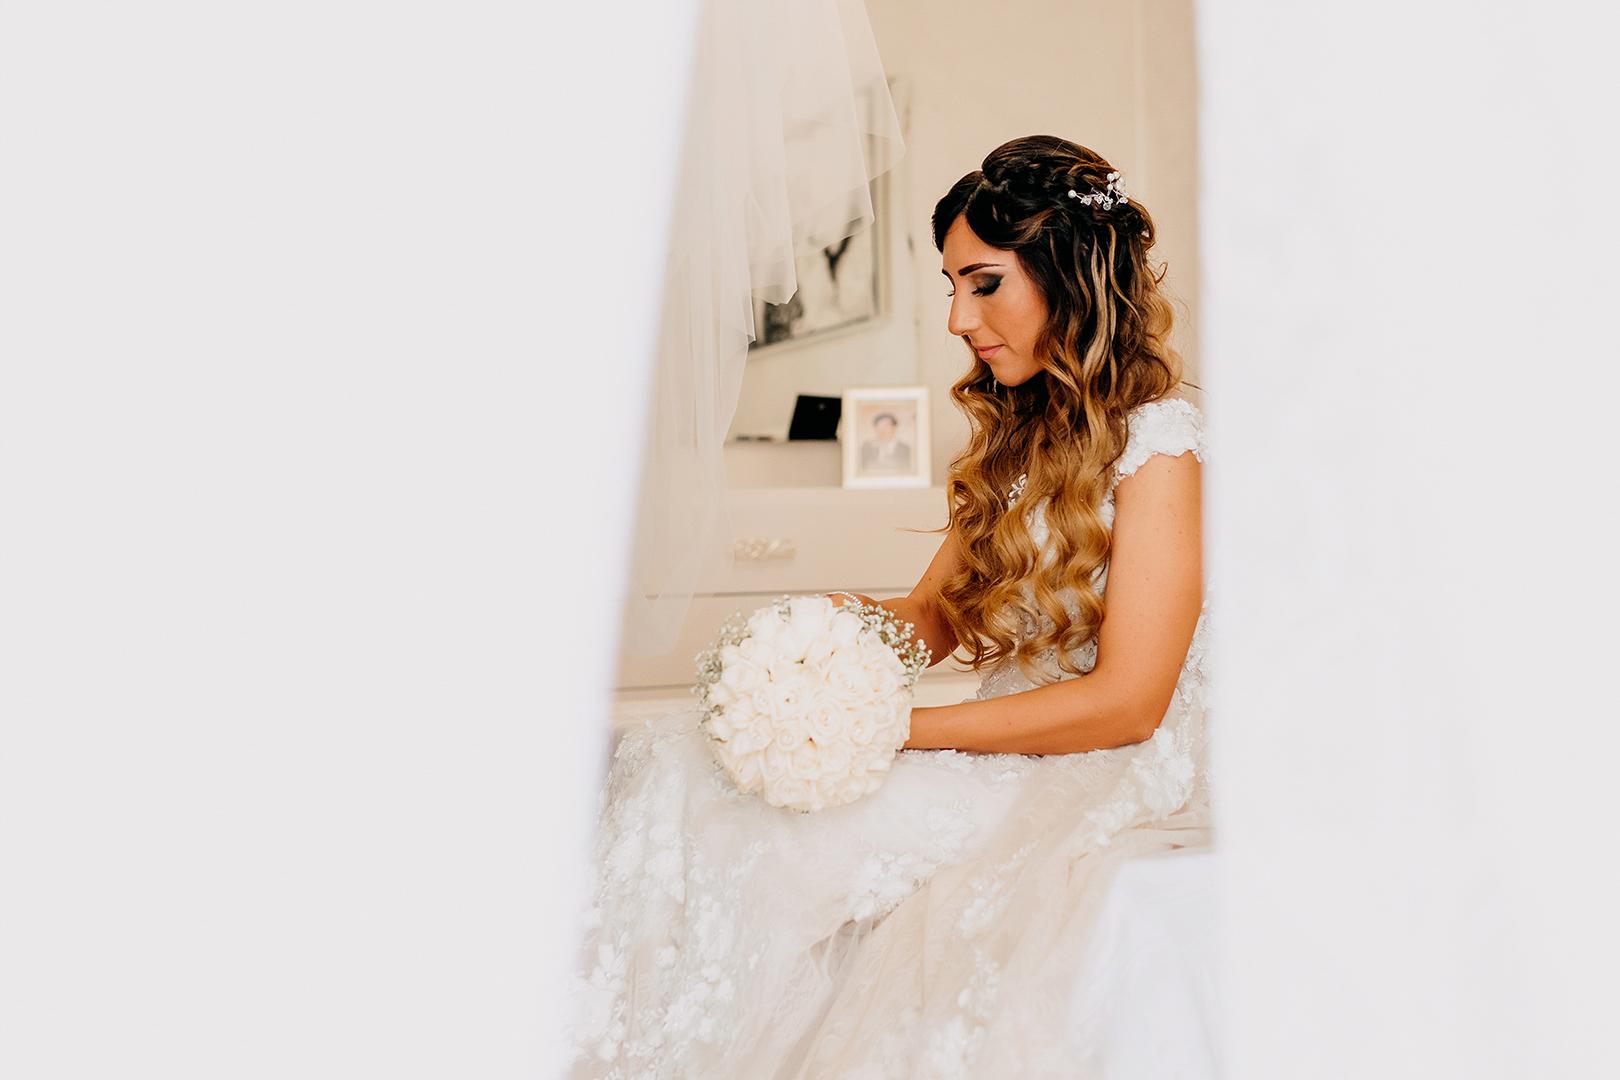 6 gianni-lepore-sposa-bouquet